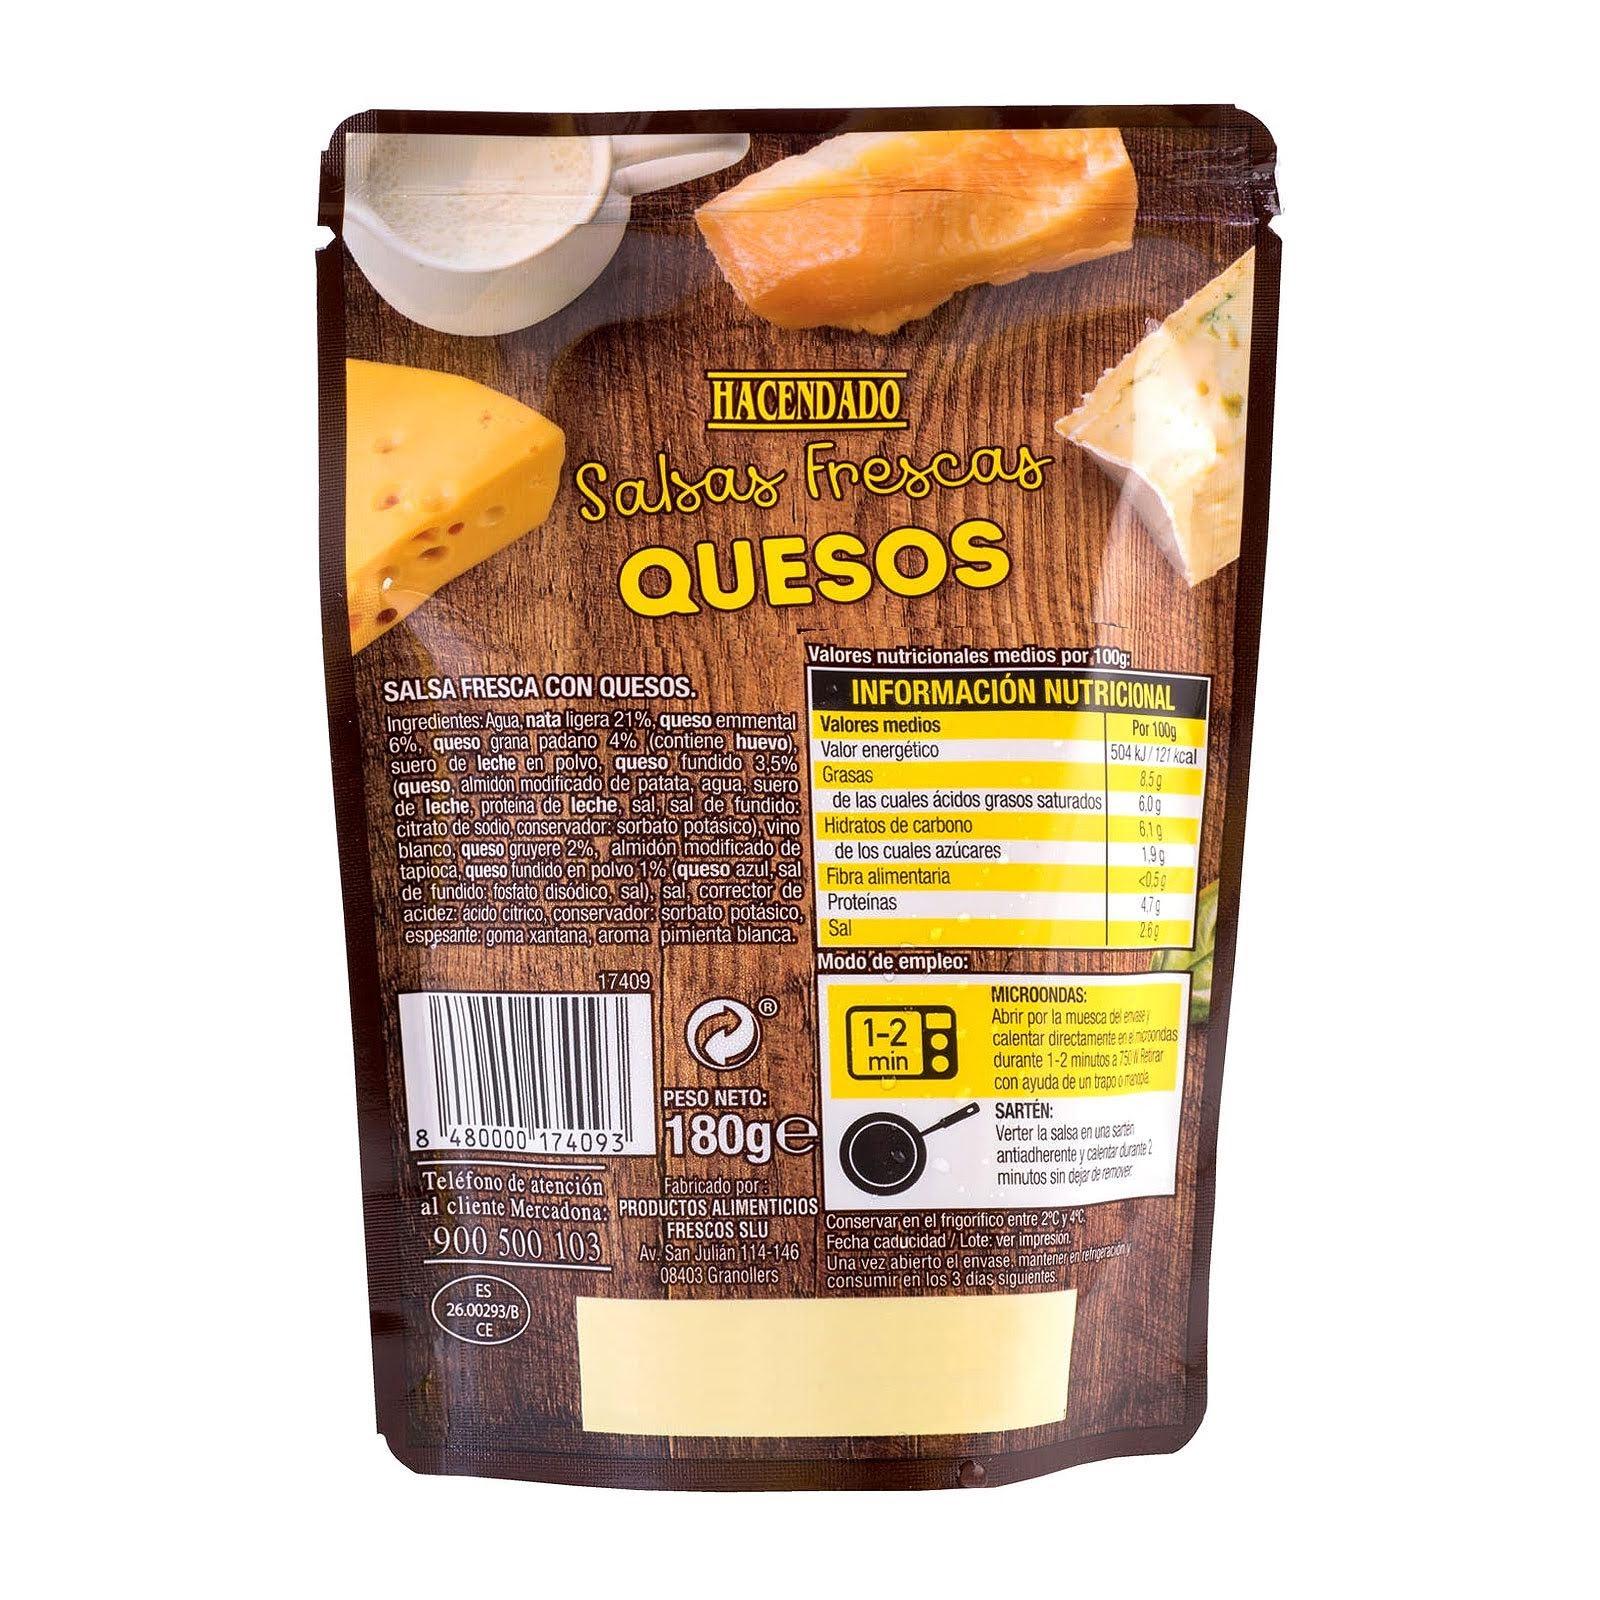 Salsa fresca quesos Hacendado